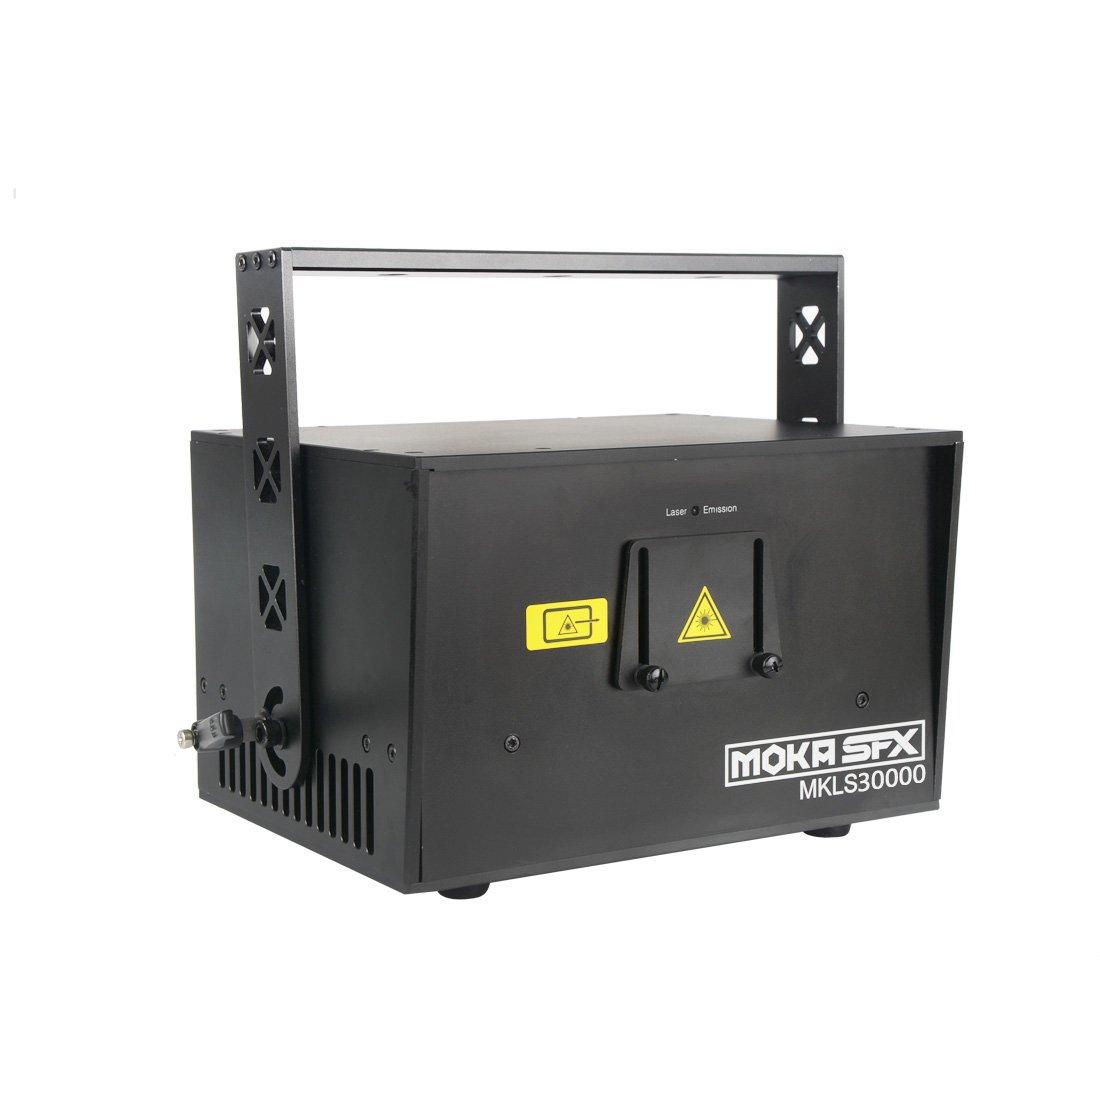 30w laser light